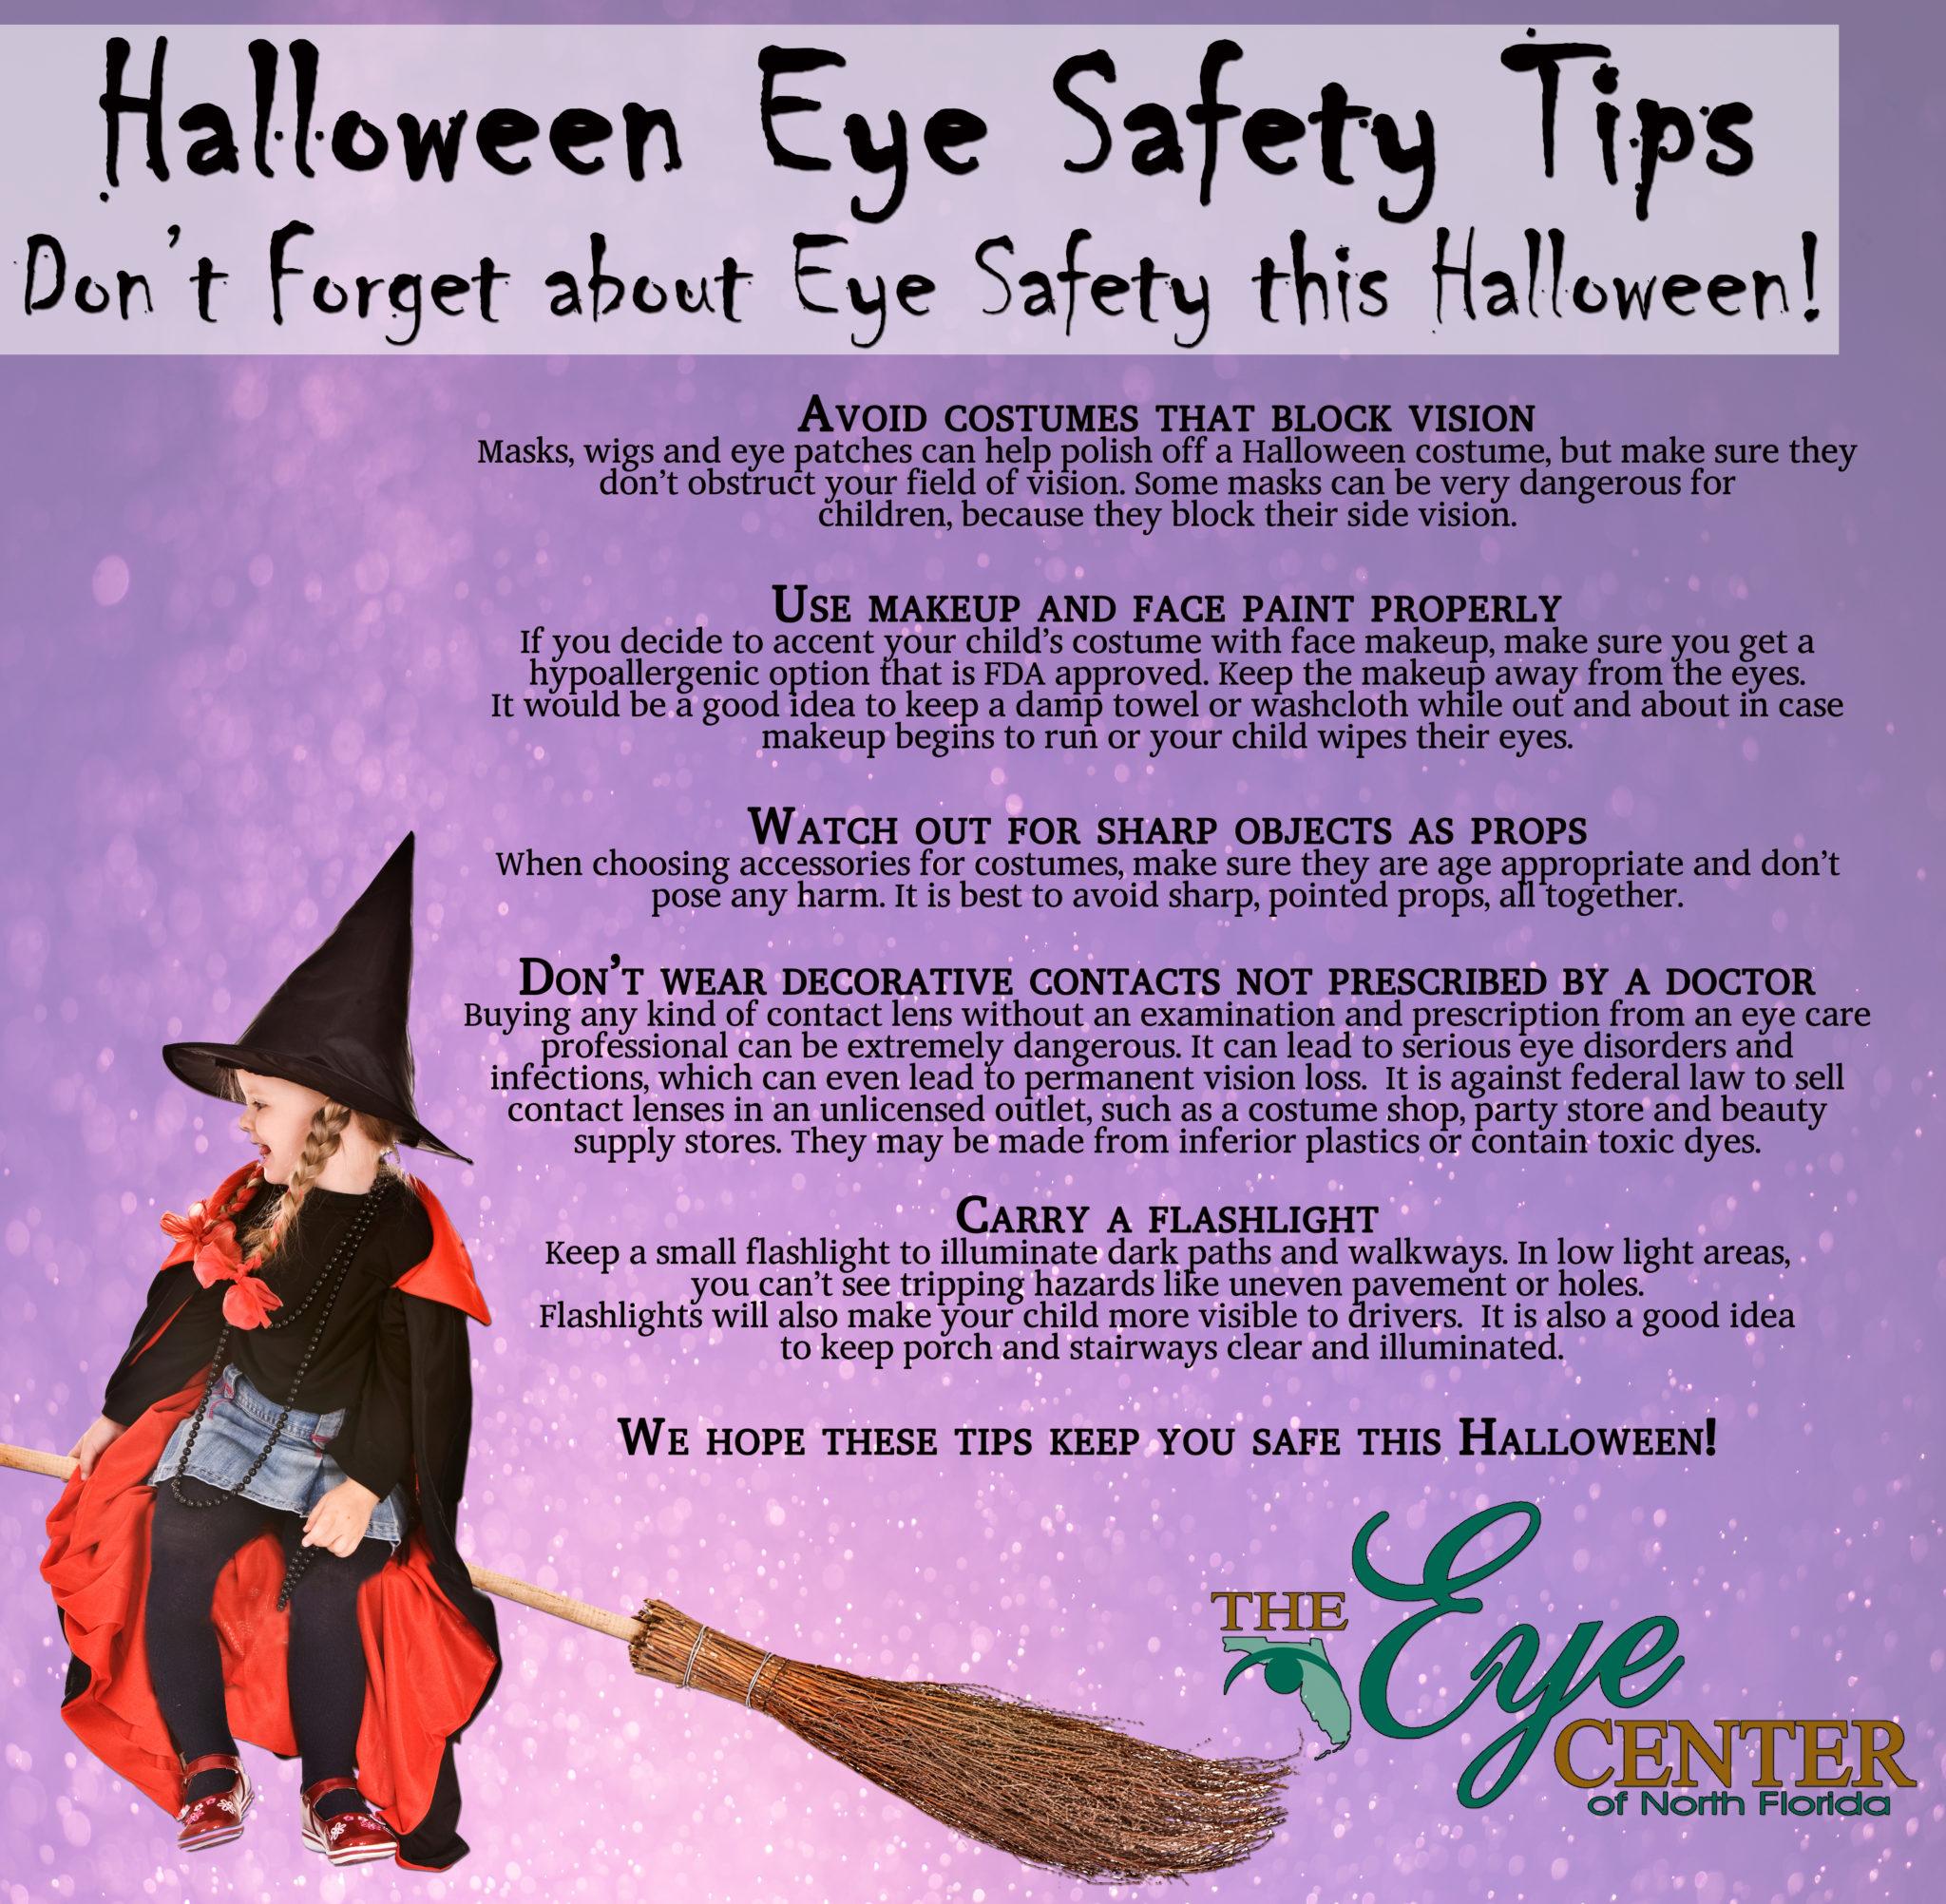 Lasik Eye Center >> Happy Halloween & Eye Safety Tips | The Eye Center of Panama City